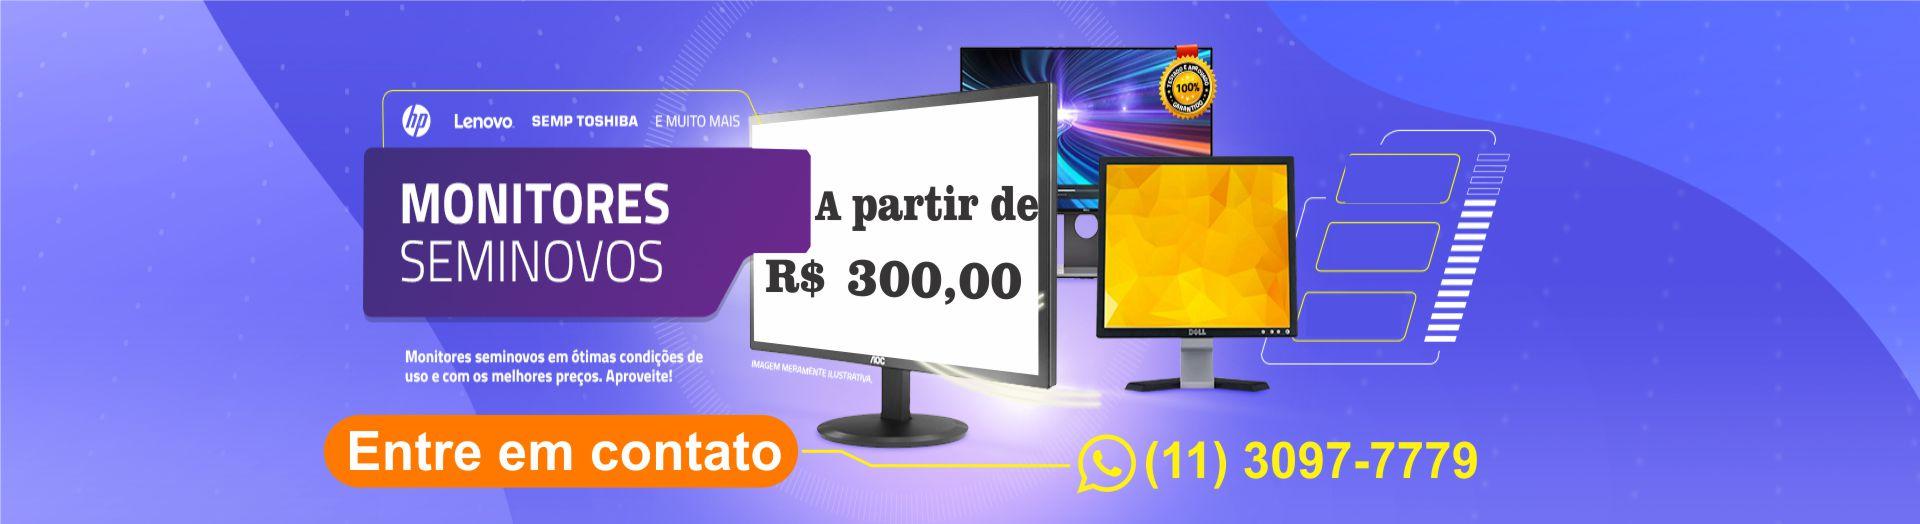 Banner-monitores-seminovos